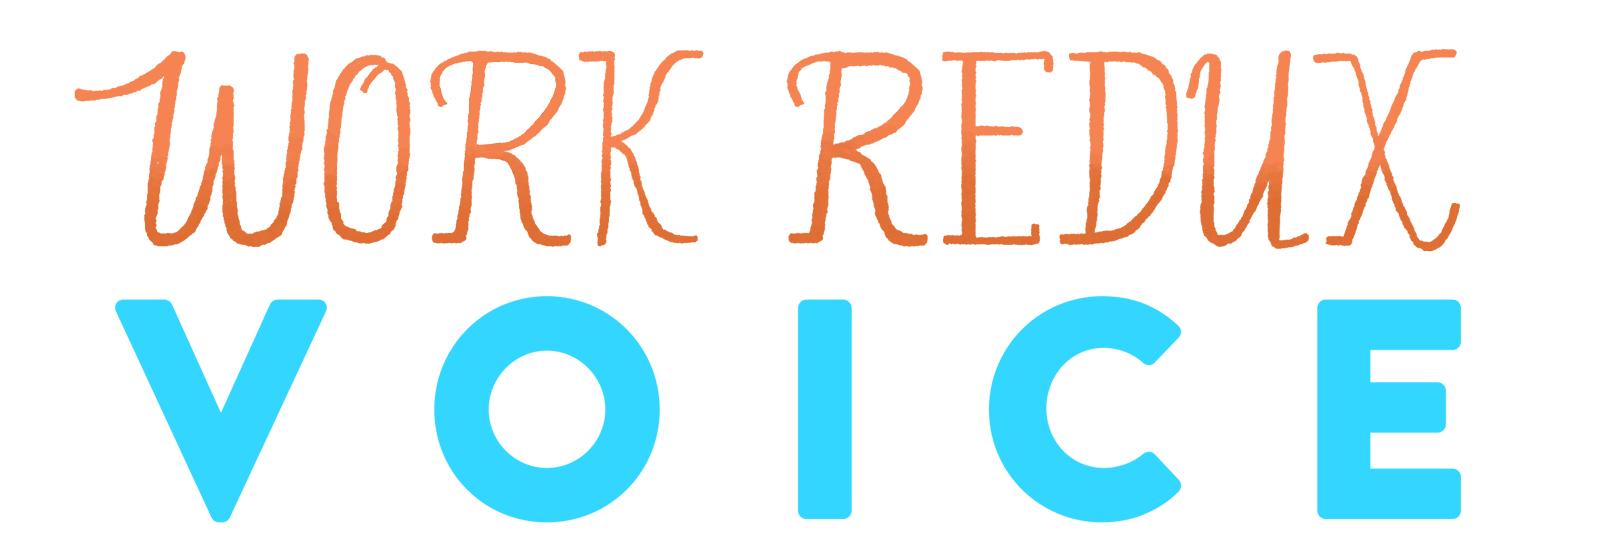 WorkRedux01_03